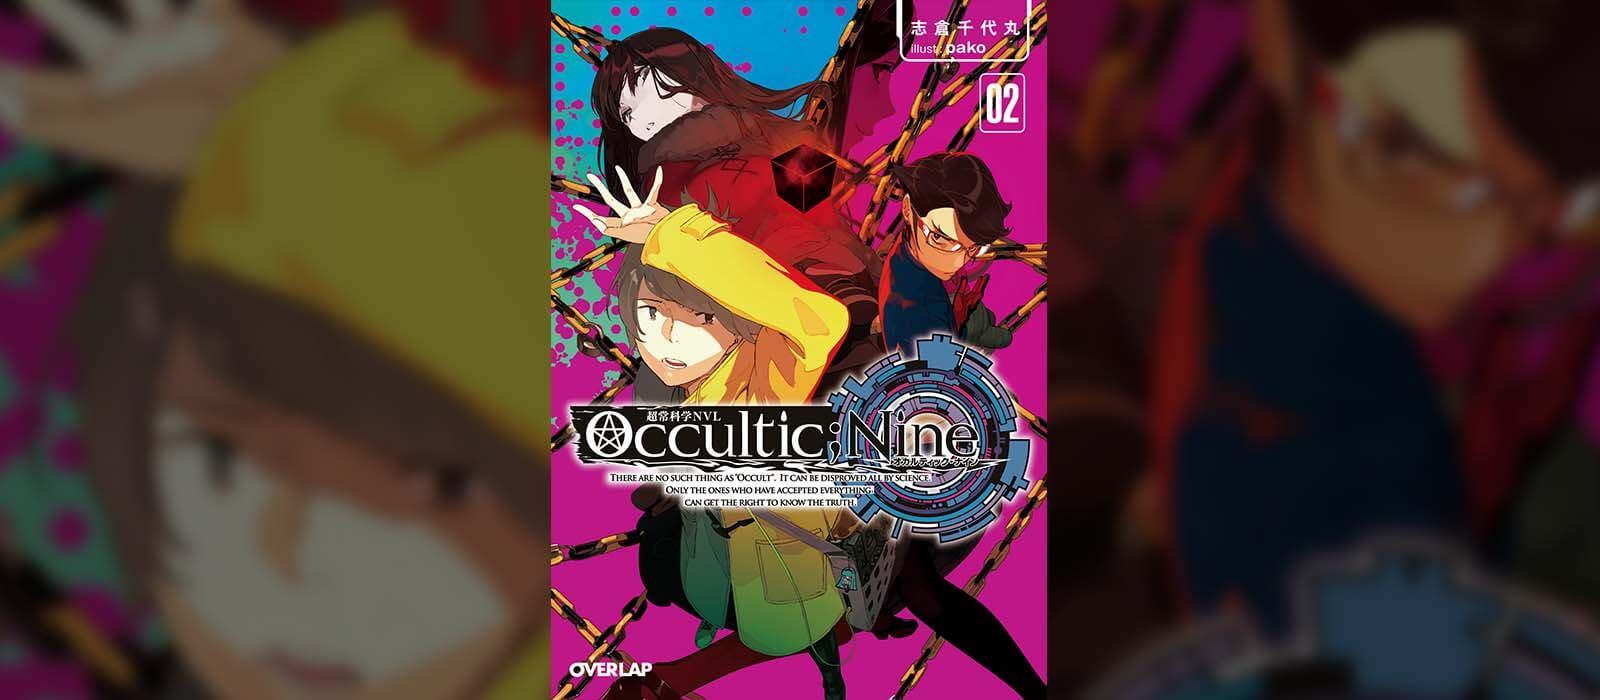 Occultic;Nine Vol. 2 Light Novel Review [Spoilers]